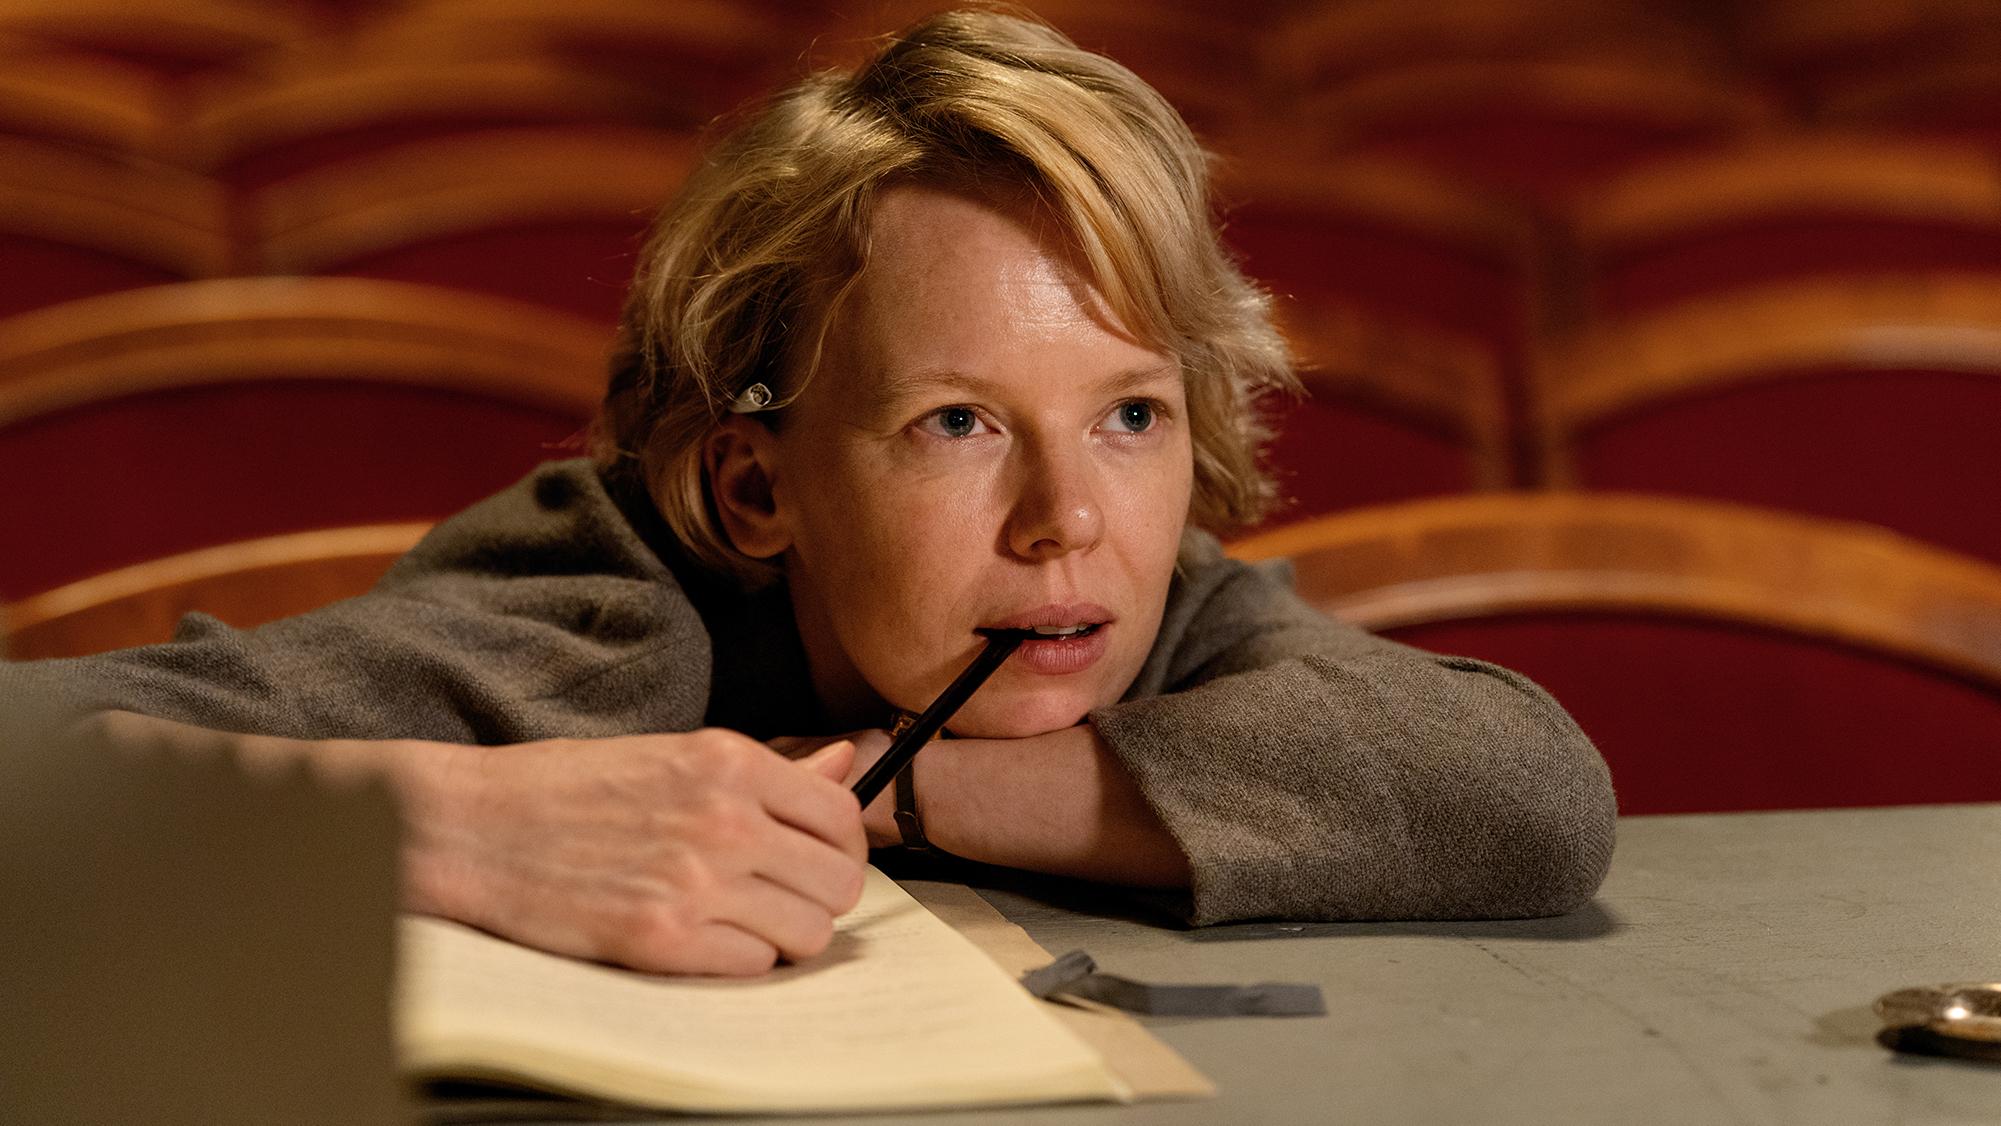 (C)2020 Helsinki-filmi, all rights reserved